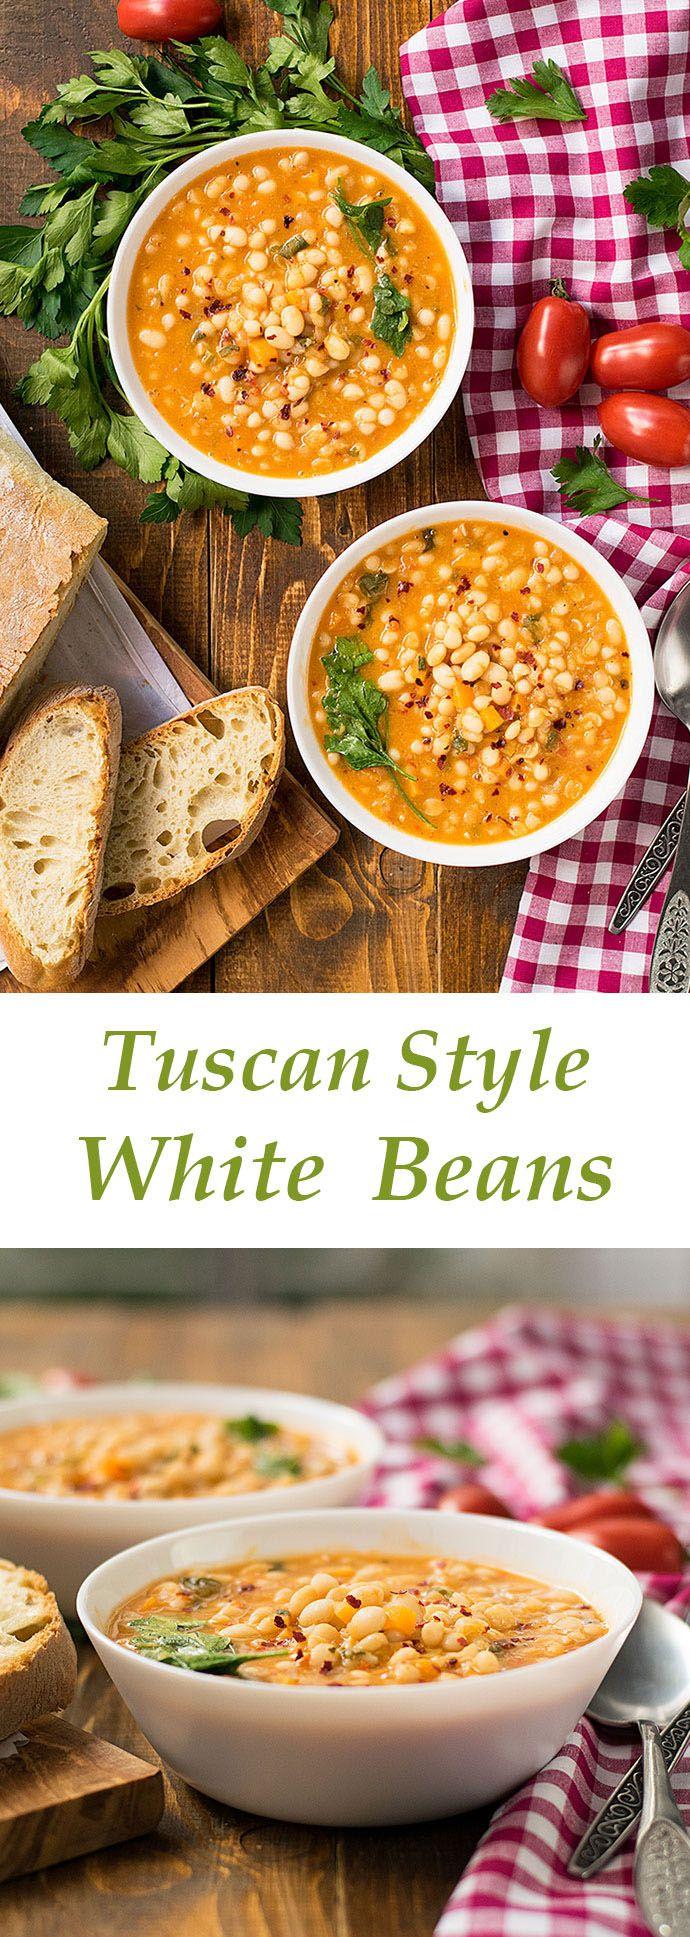 tuscan style white beans | thehungrybites.com